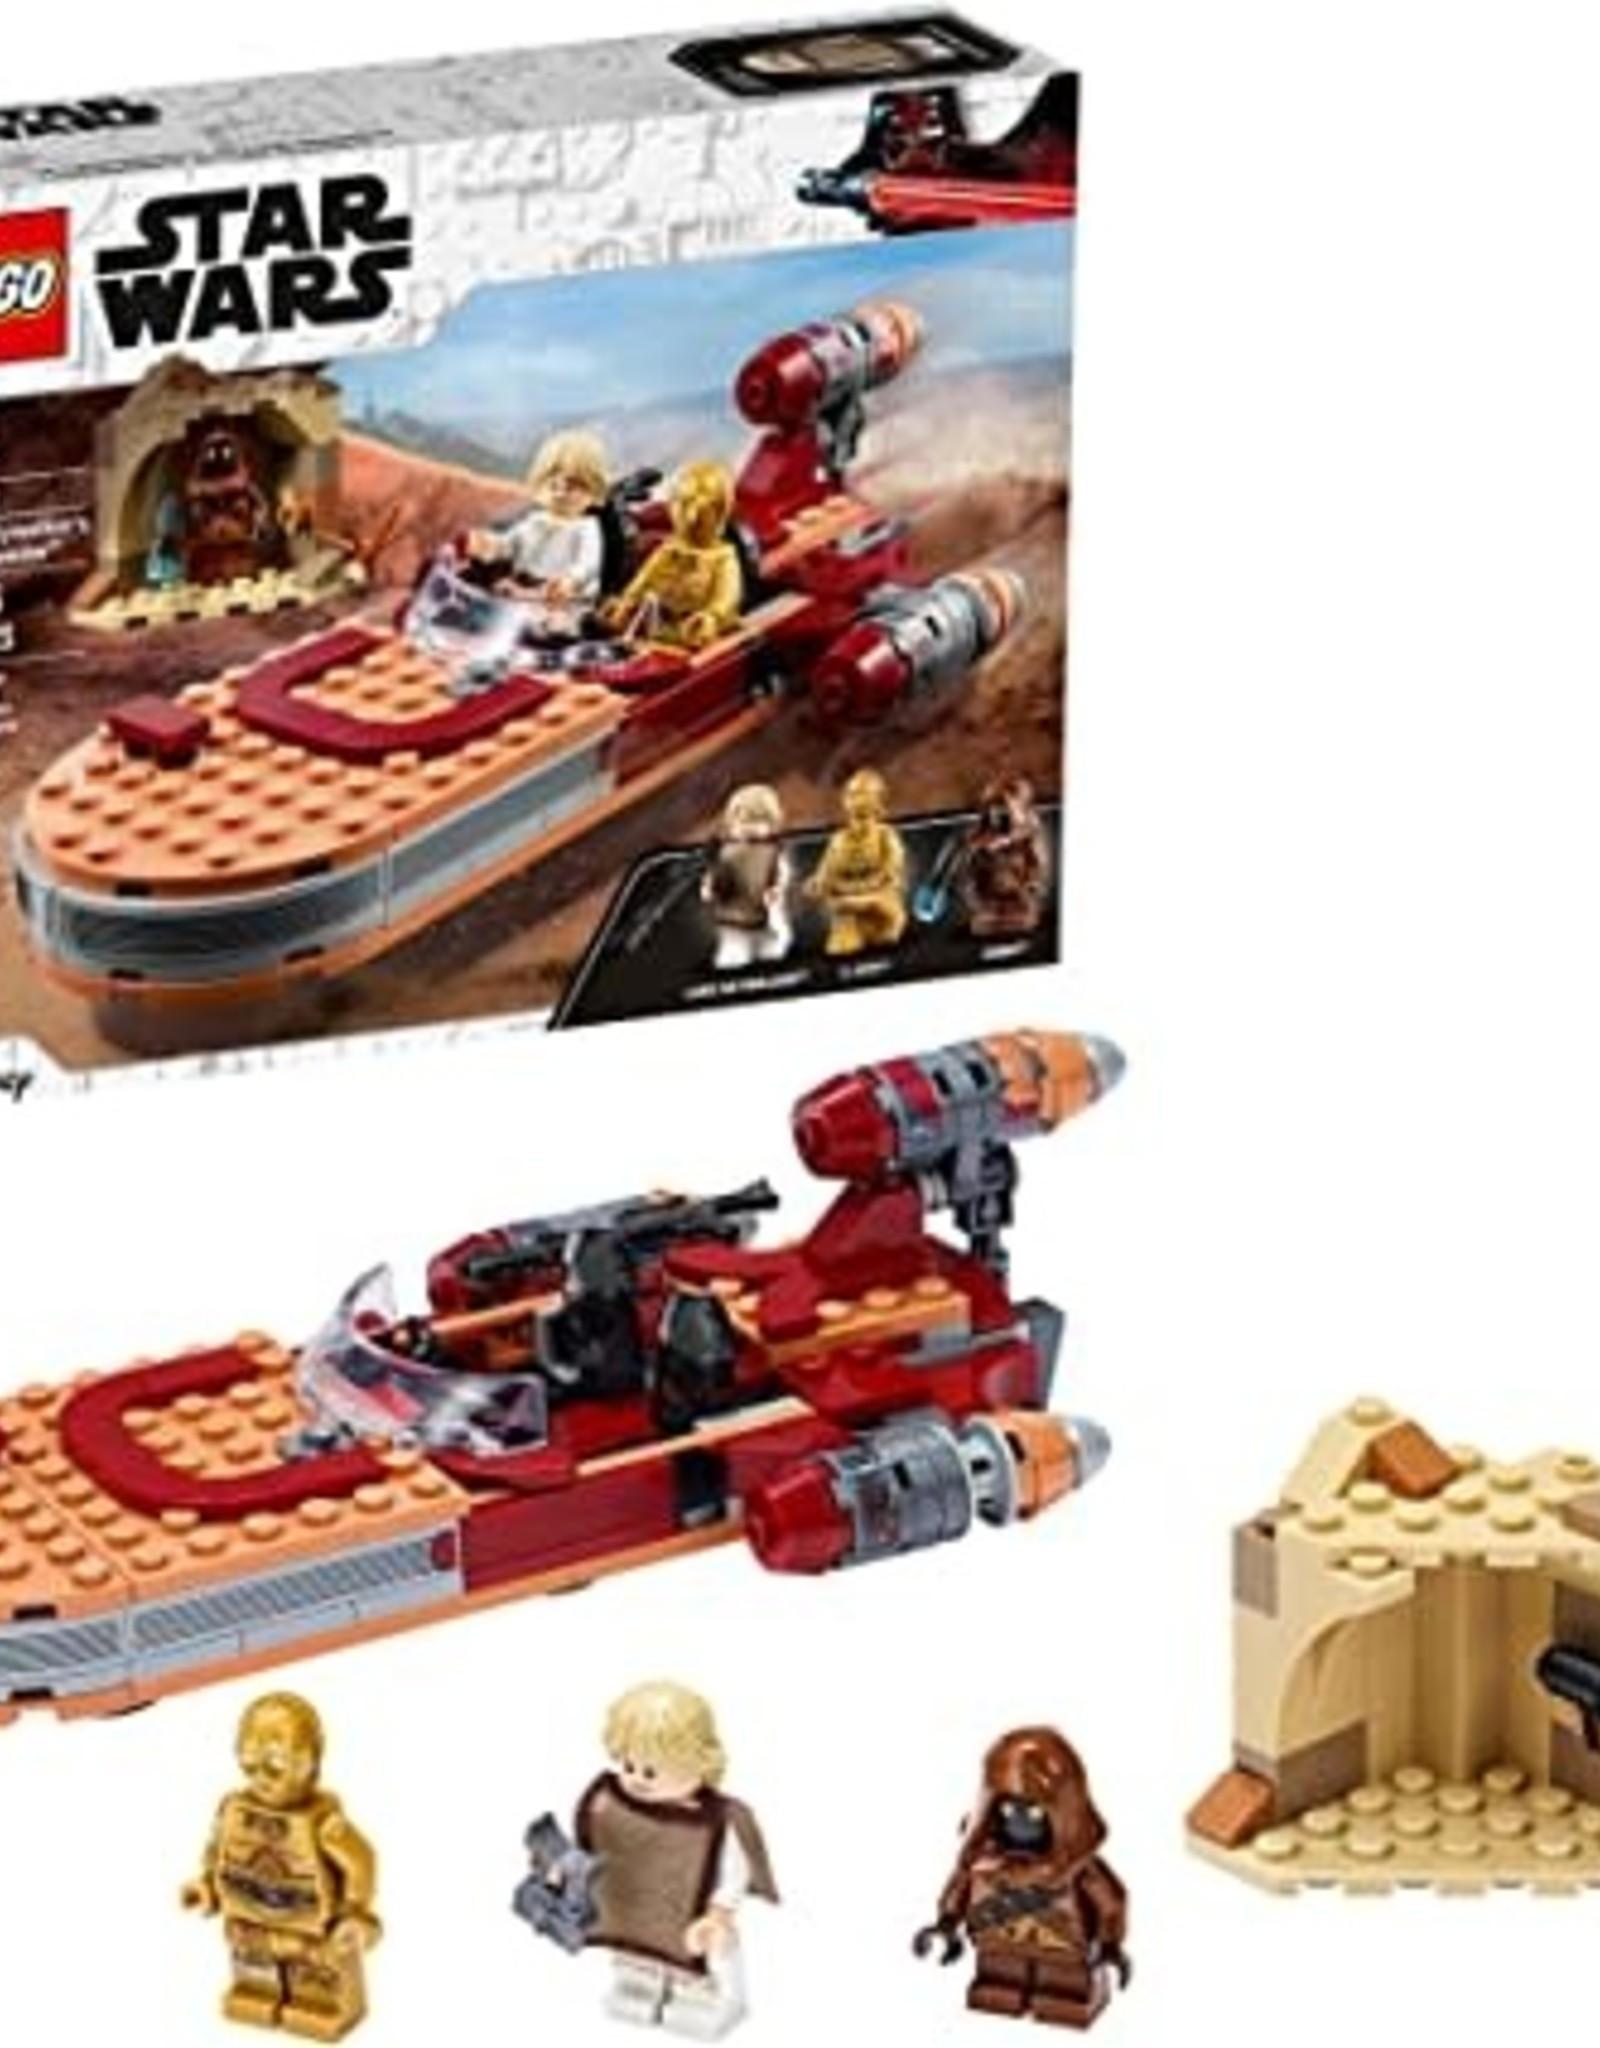 Star Wars Luke Skywalker's Landspeeder